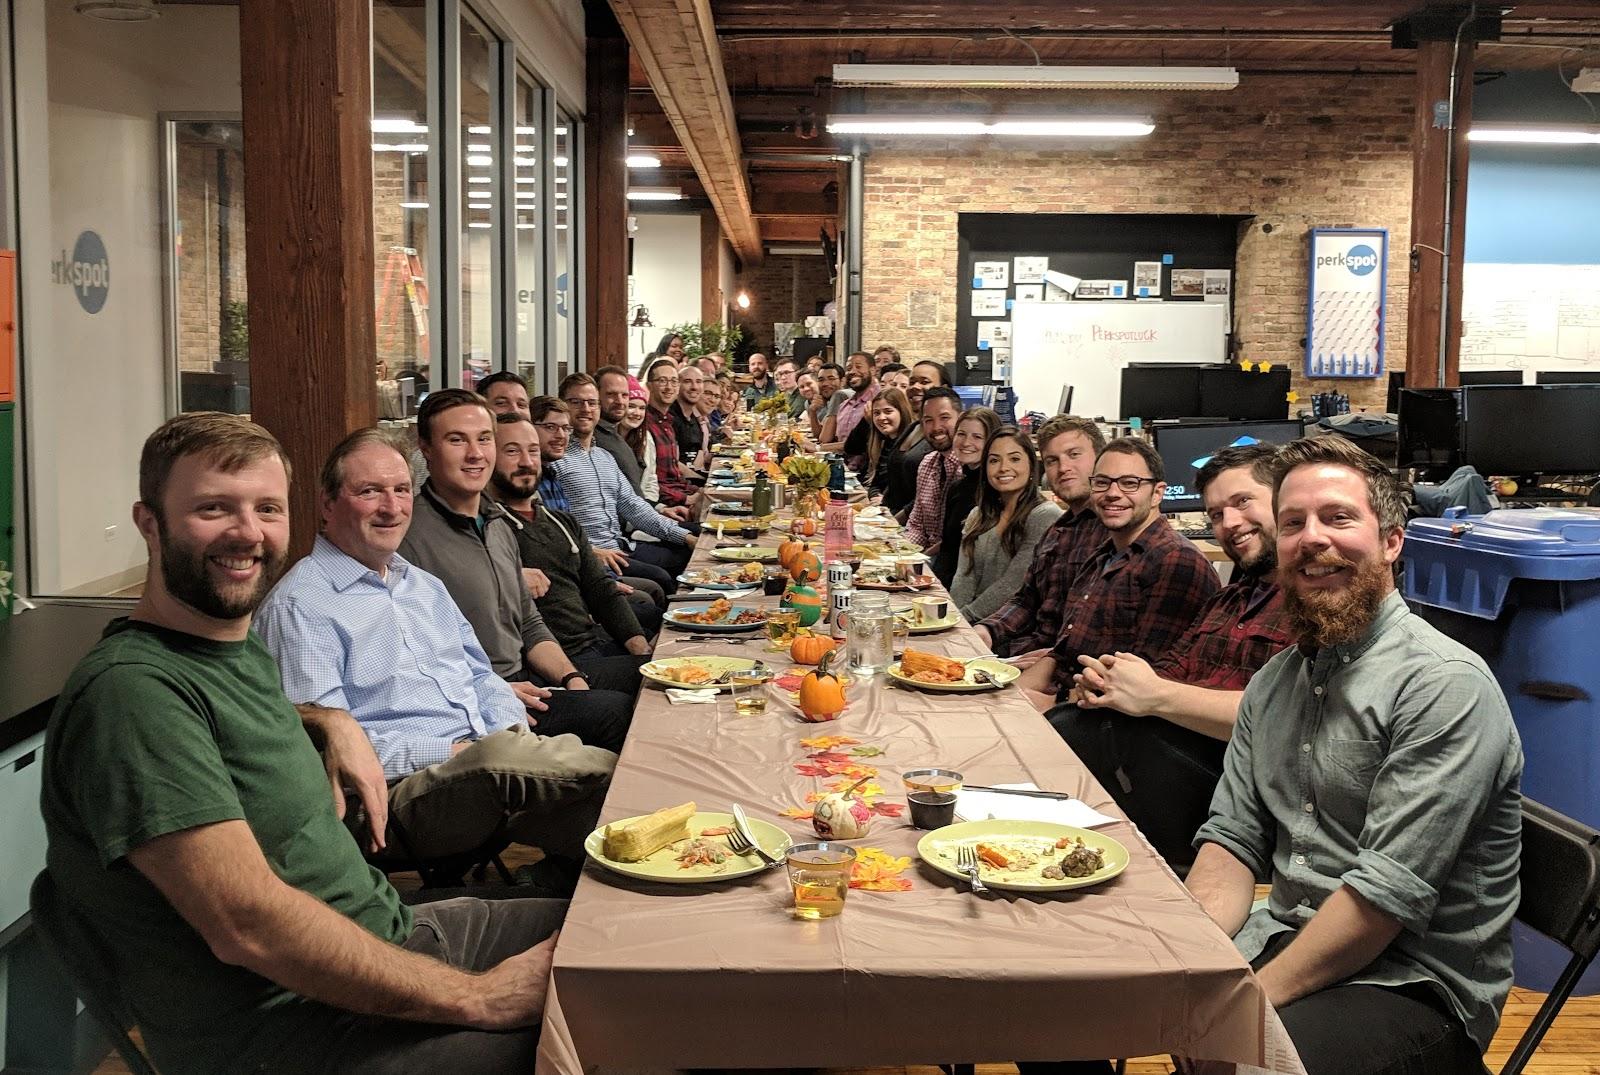 PerkSpot's team gathering in a restaurant